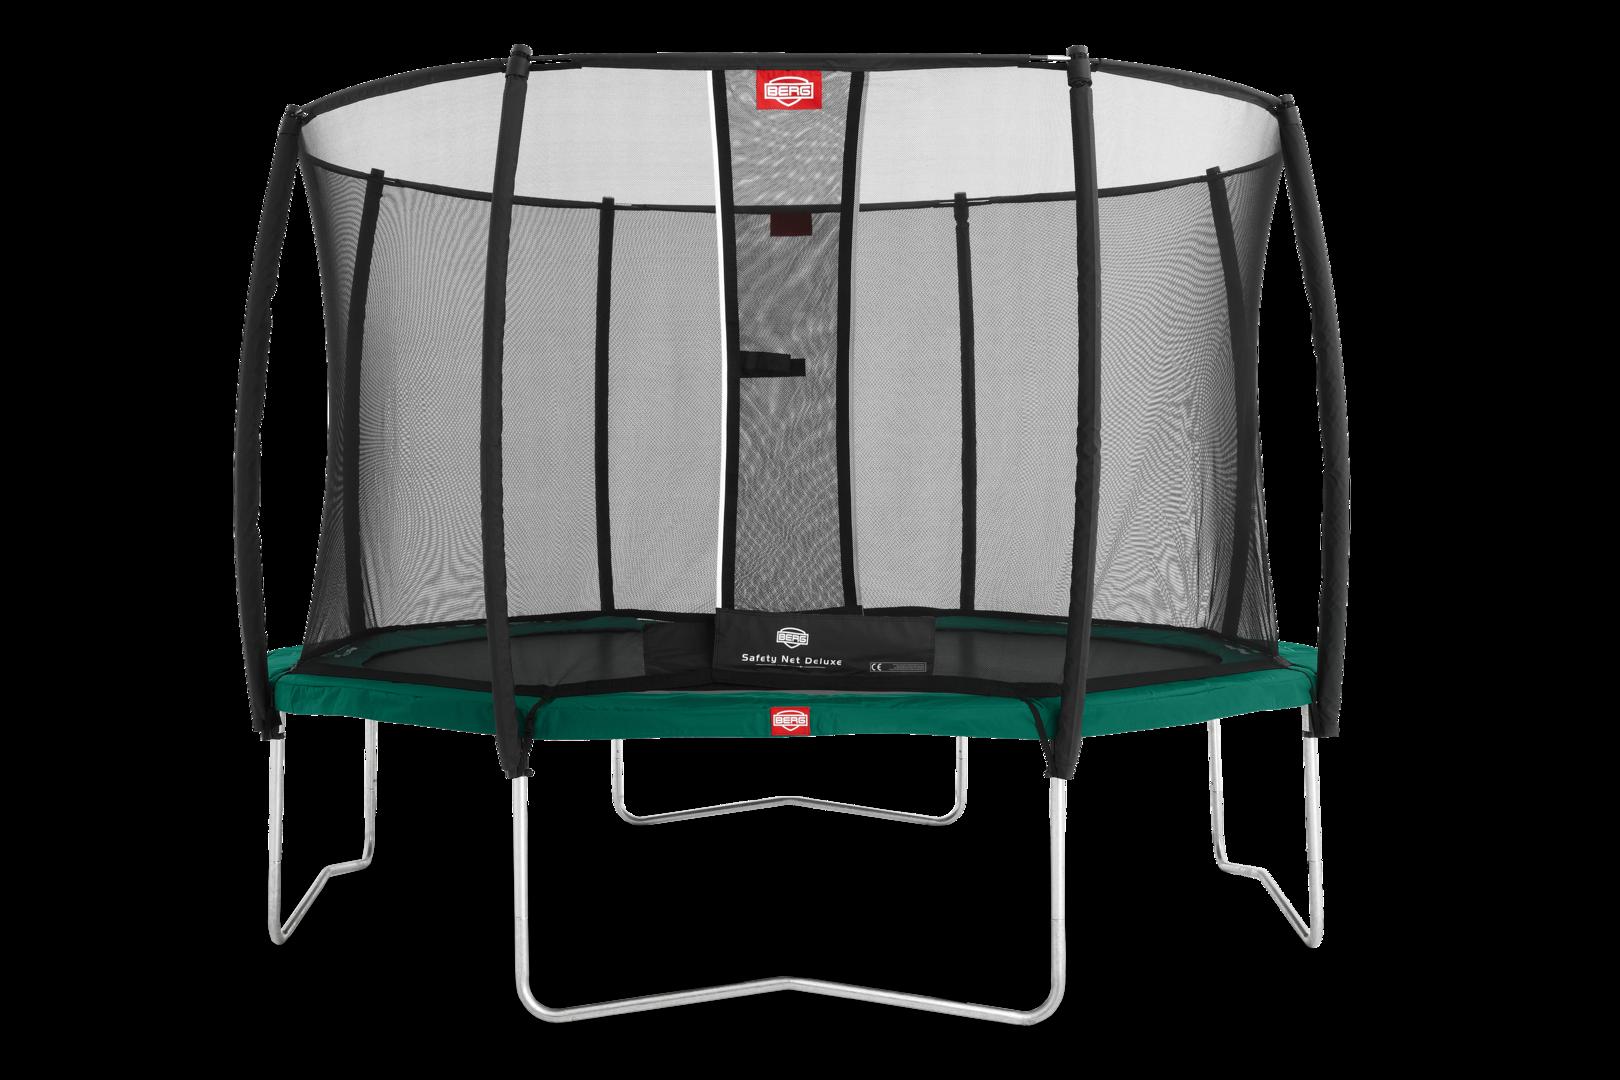 berg trampolin favorit 380 sicherheitsnetz deluxe sonntag toys. Black Bedroom Furniture Sets. Home Design Ideas